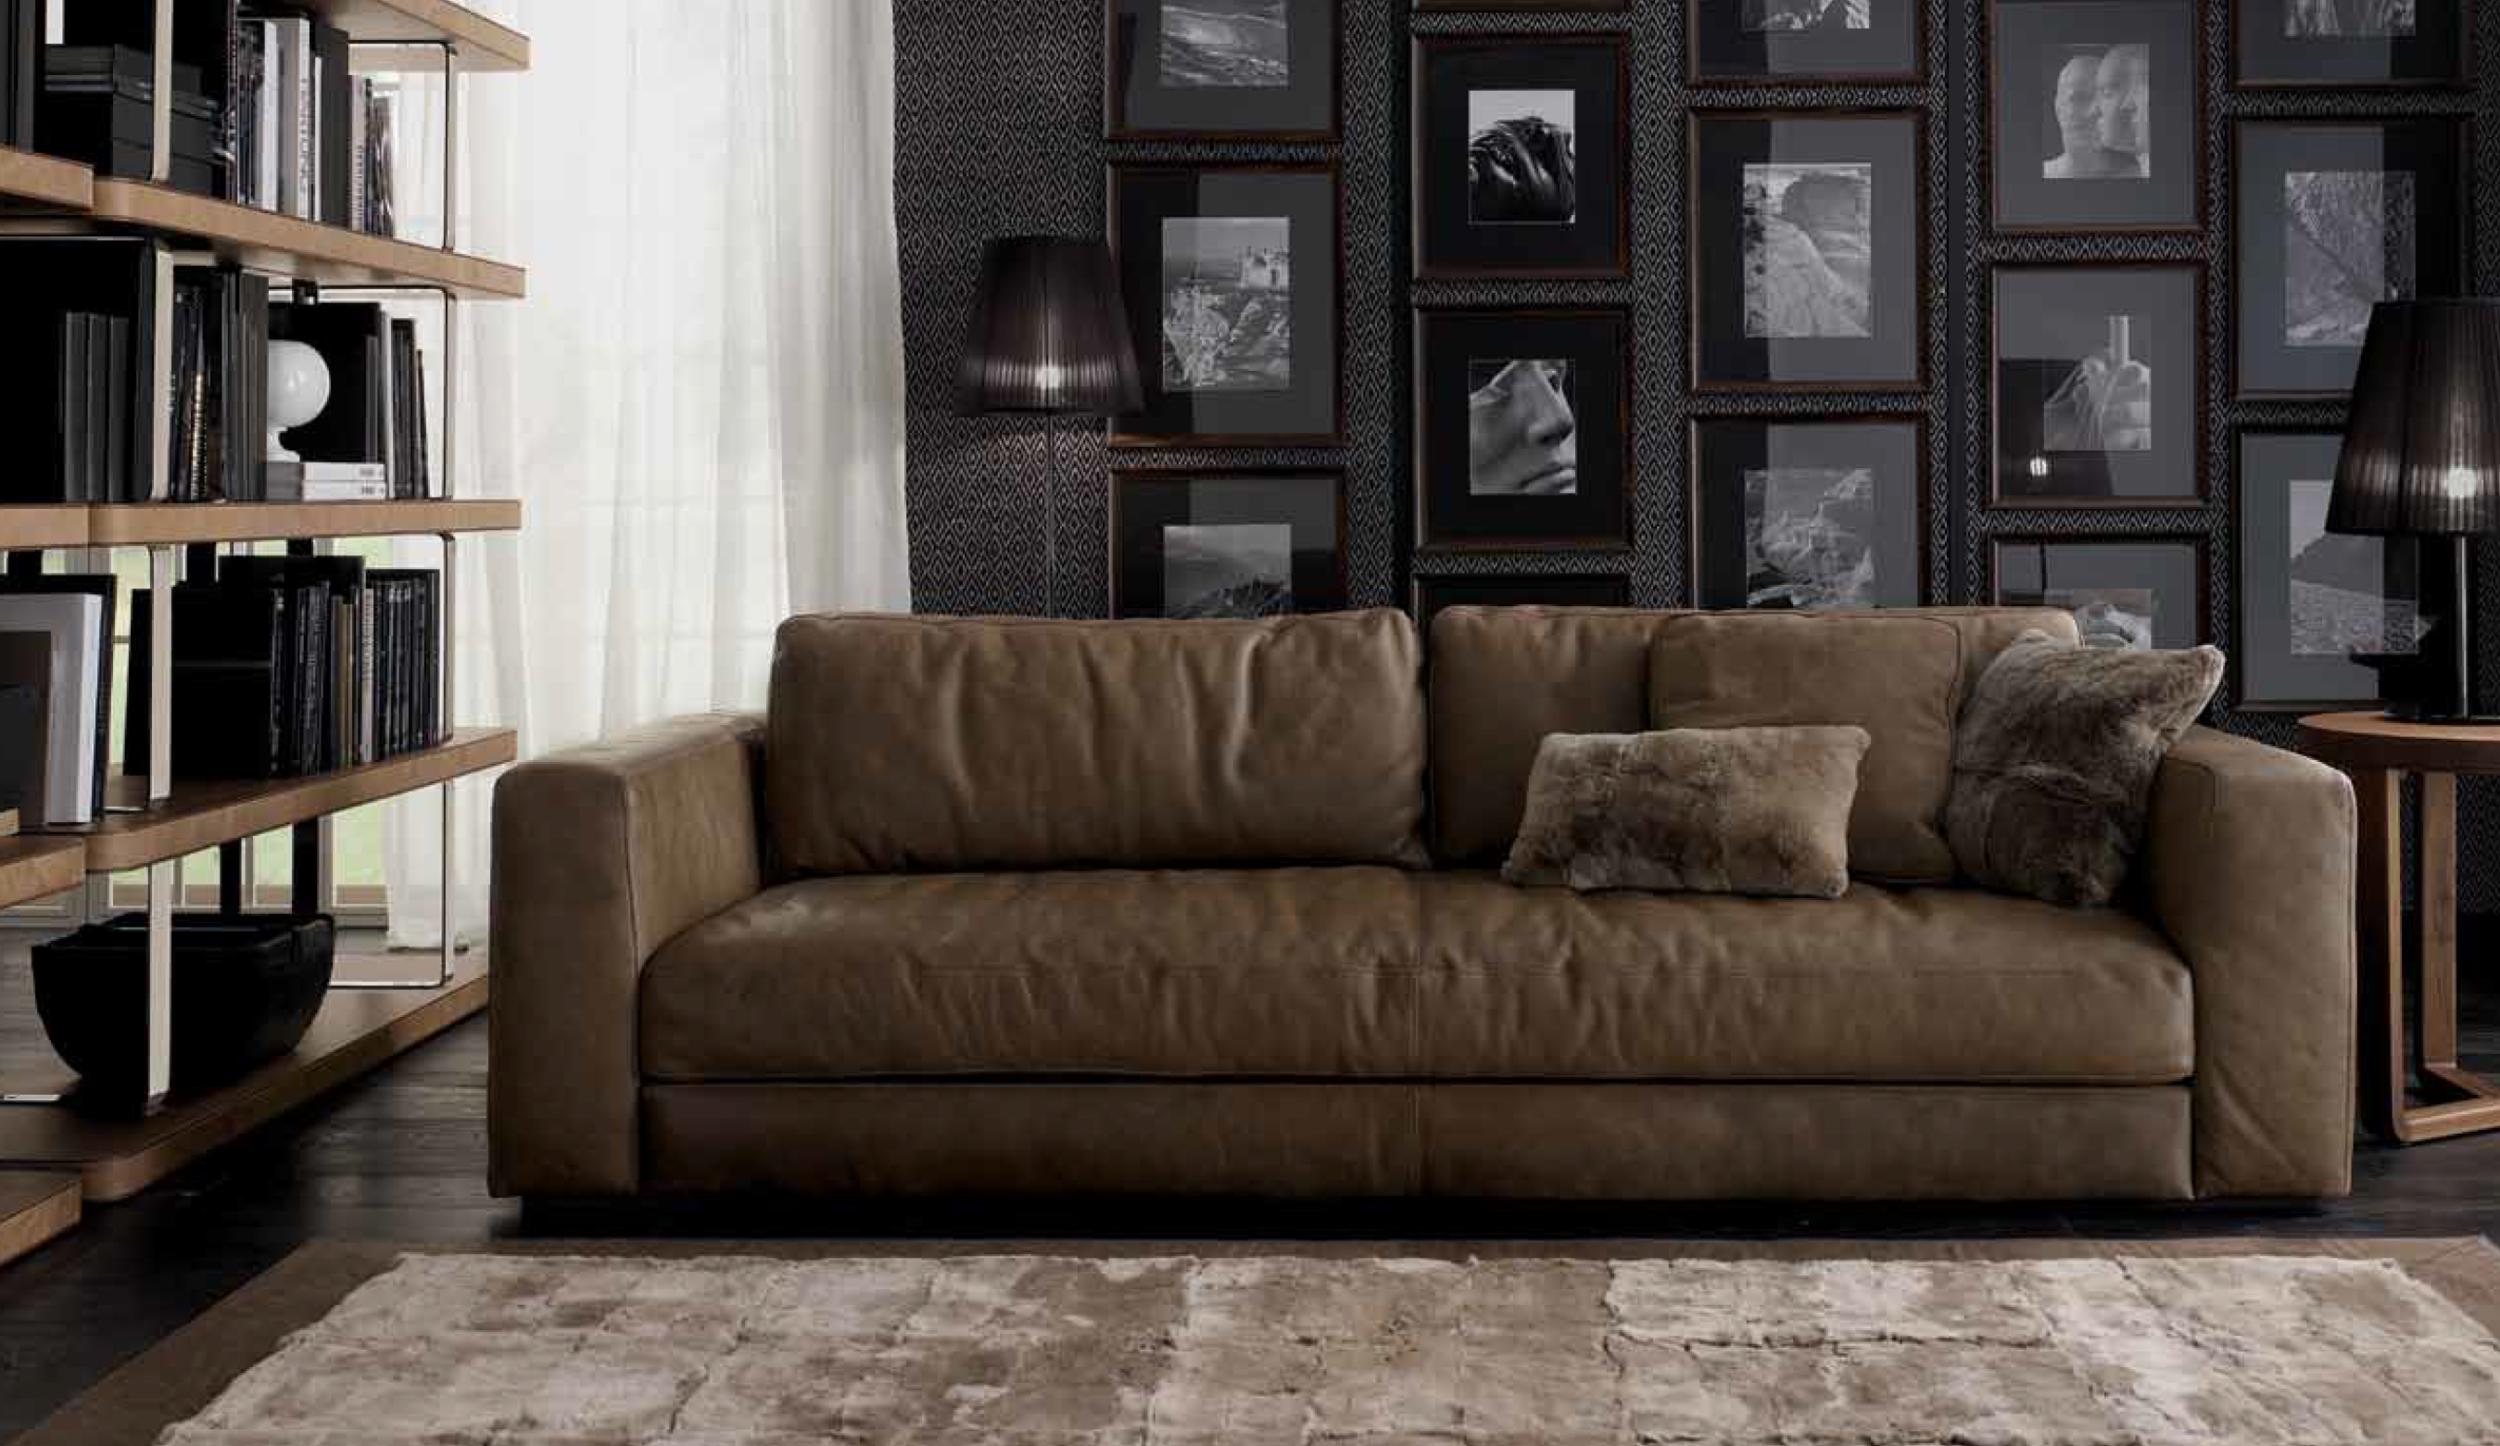 Ulivi Salotti living area -An Ode to Leather @ Masha Shapiro Agency.jpg